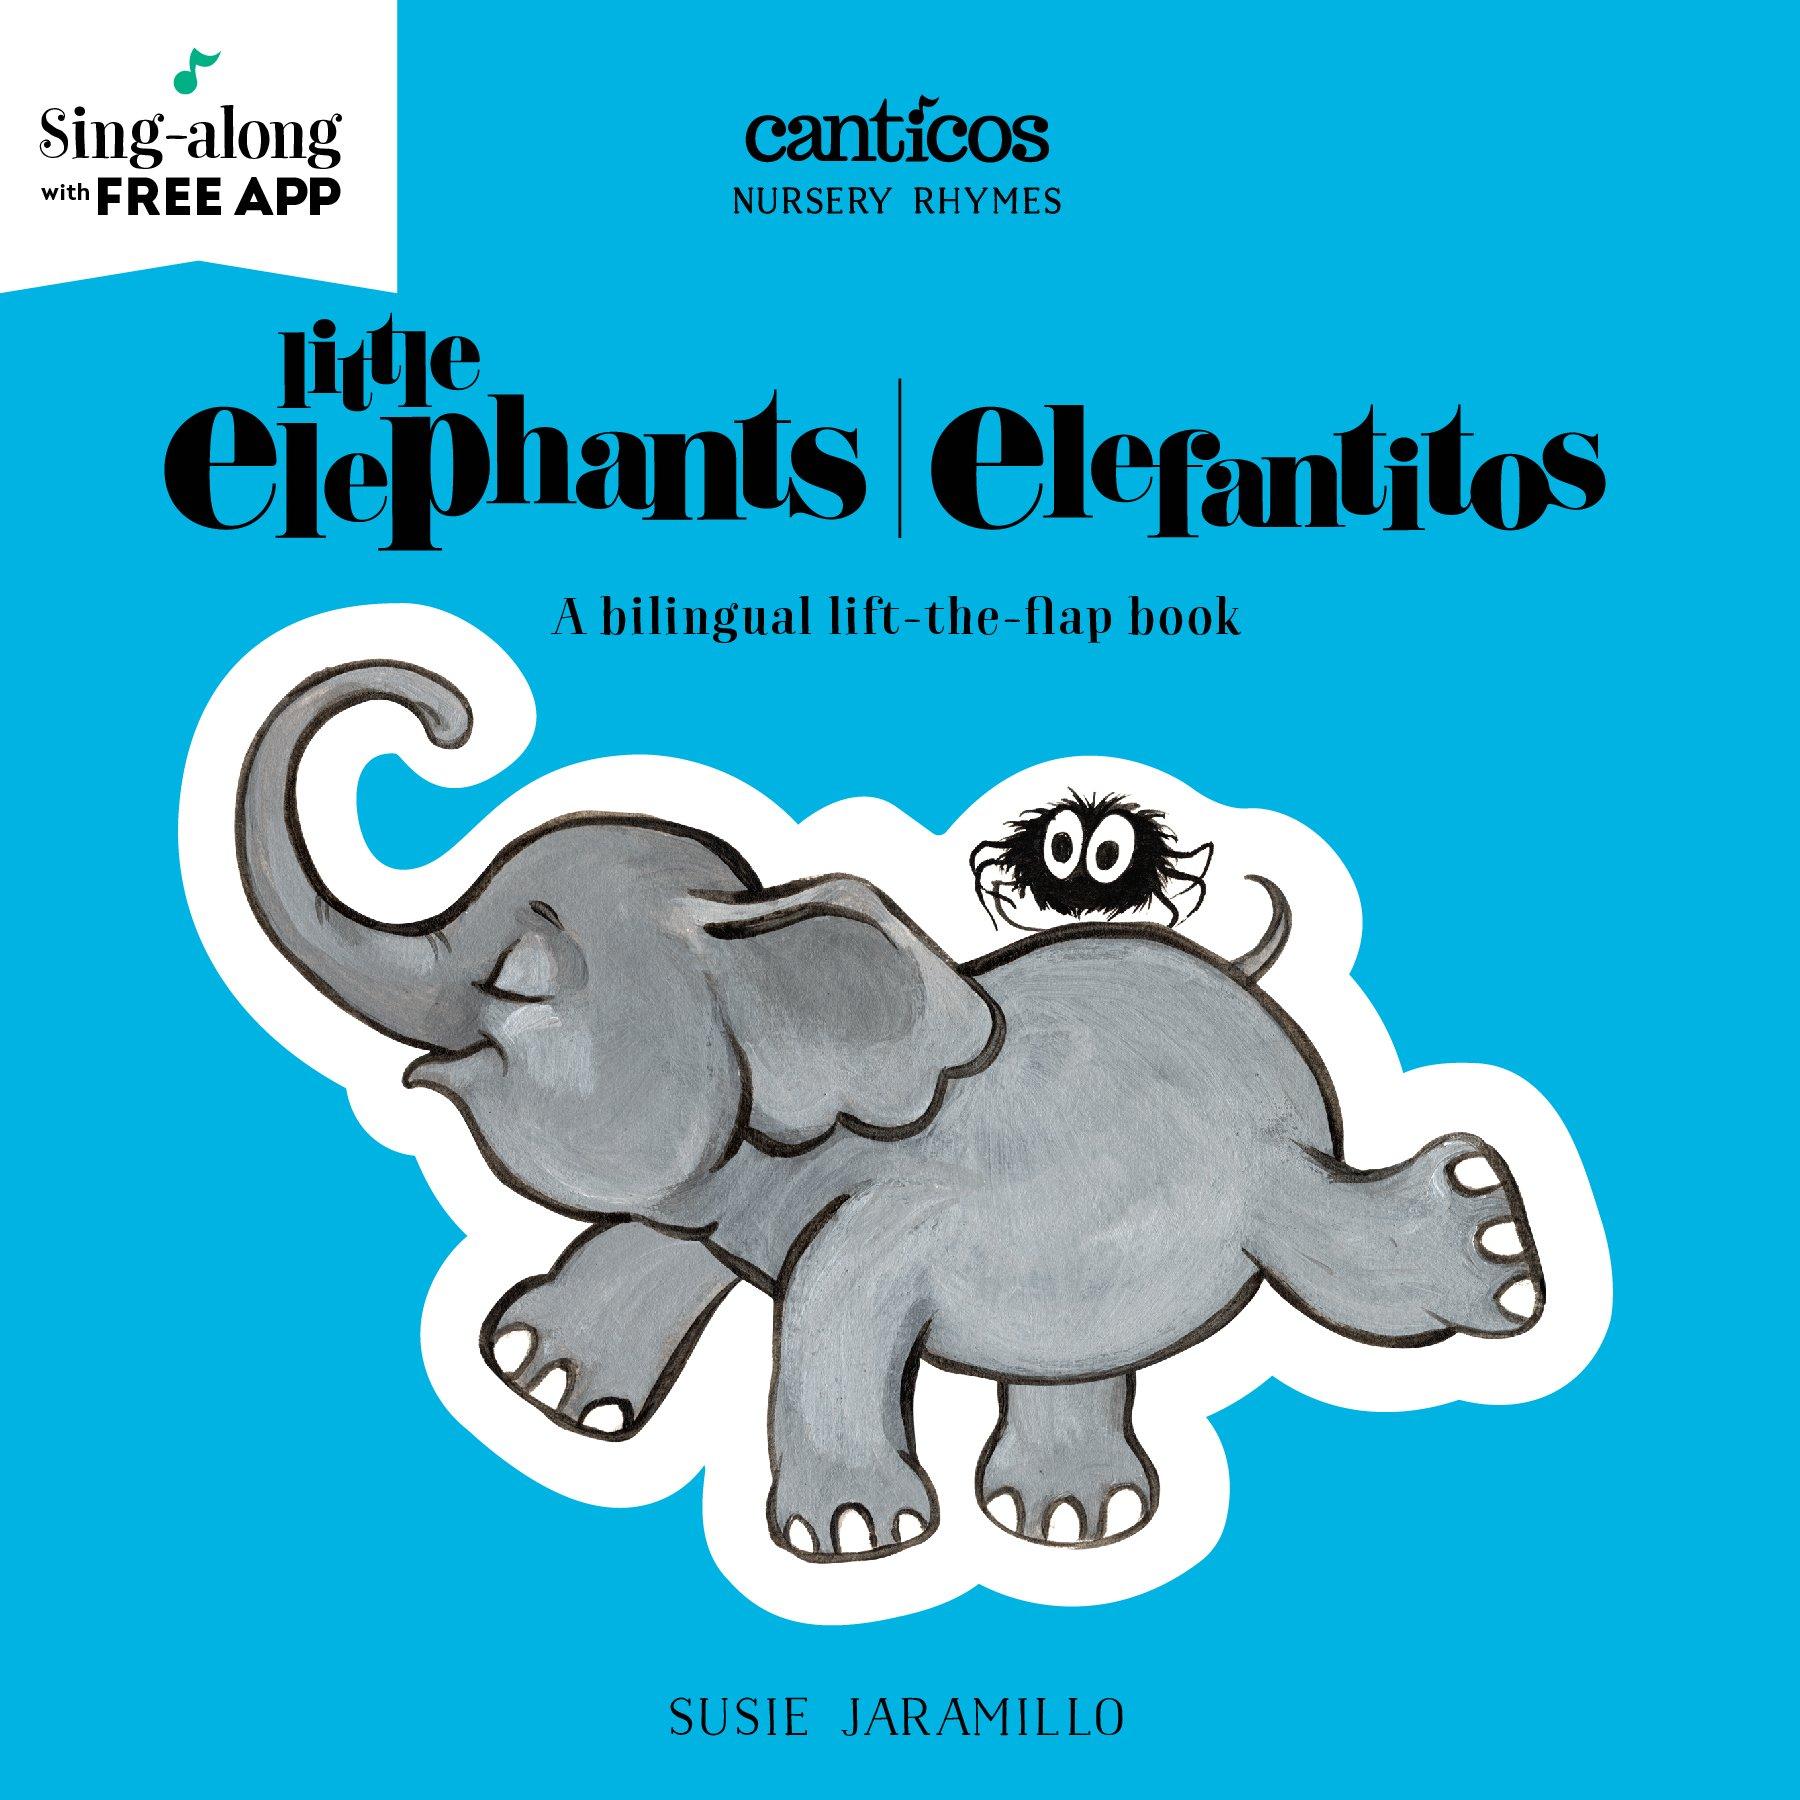 Amazon.com: Little Elephants/Elefantitos (Canticos) (9781945635144 ...